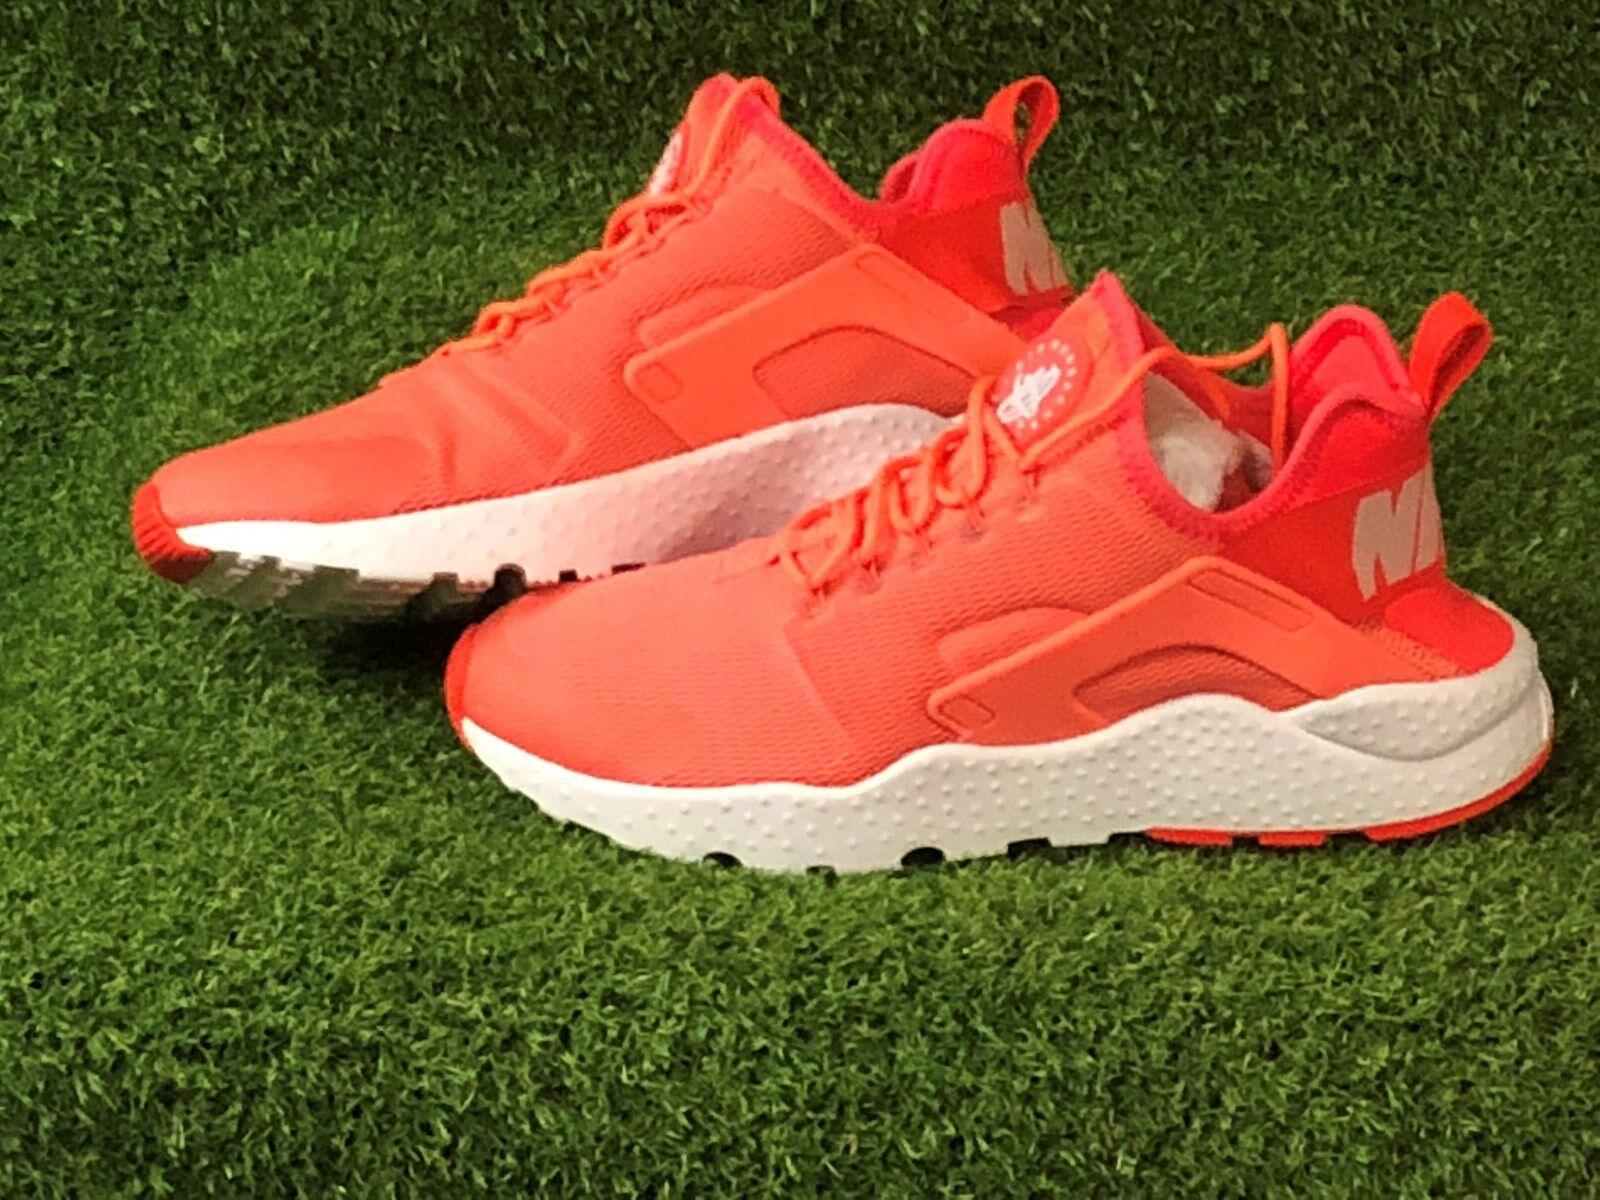 Nike W huarache run ultra cortos señora [819151 800] nuevo tamaño elegir